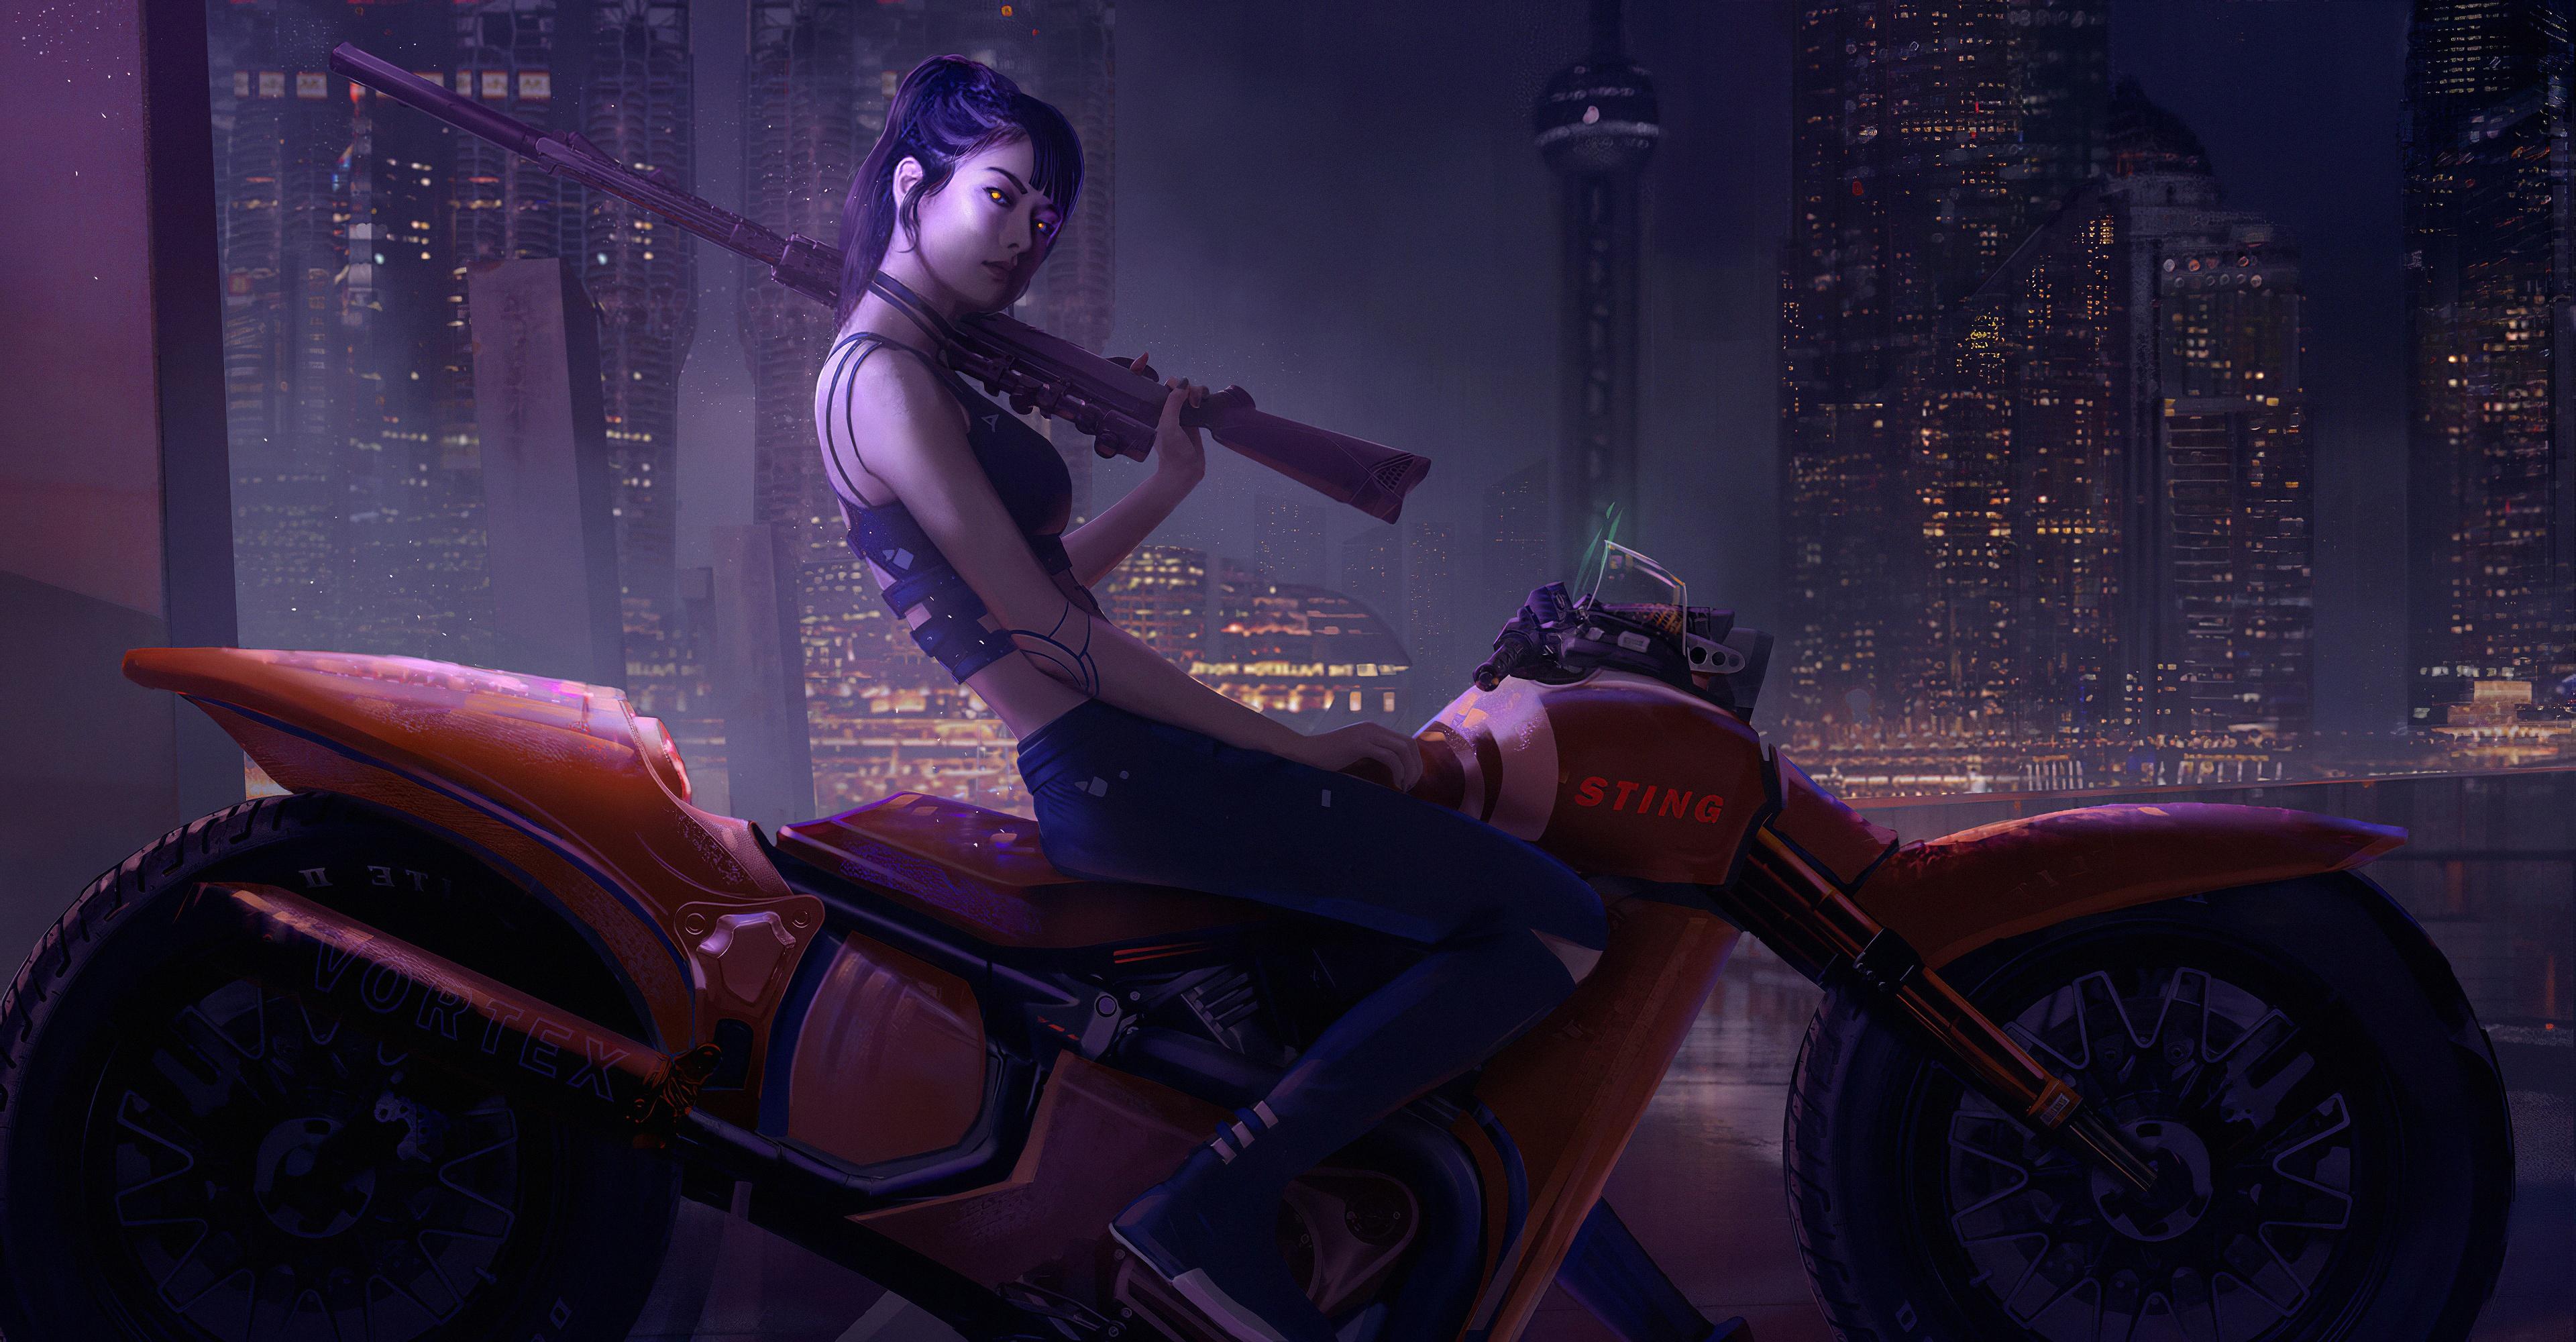 General 3840x2000 science fiction concept art artwork fantasy art fan art 3D CGI painting closeup realistic cyberpunk science fiction women weapon vehicle motorcycle glowing eyes